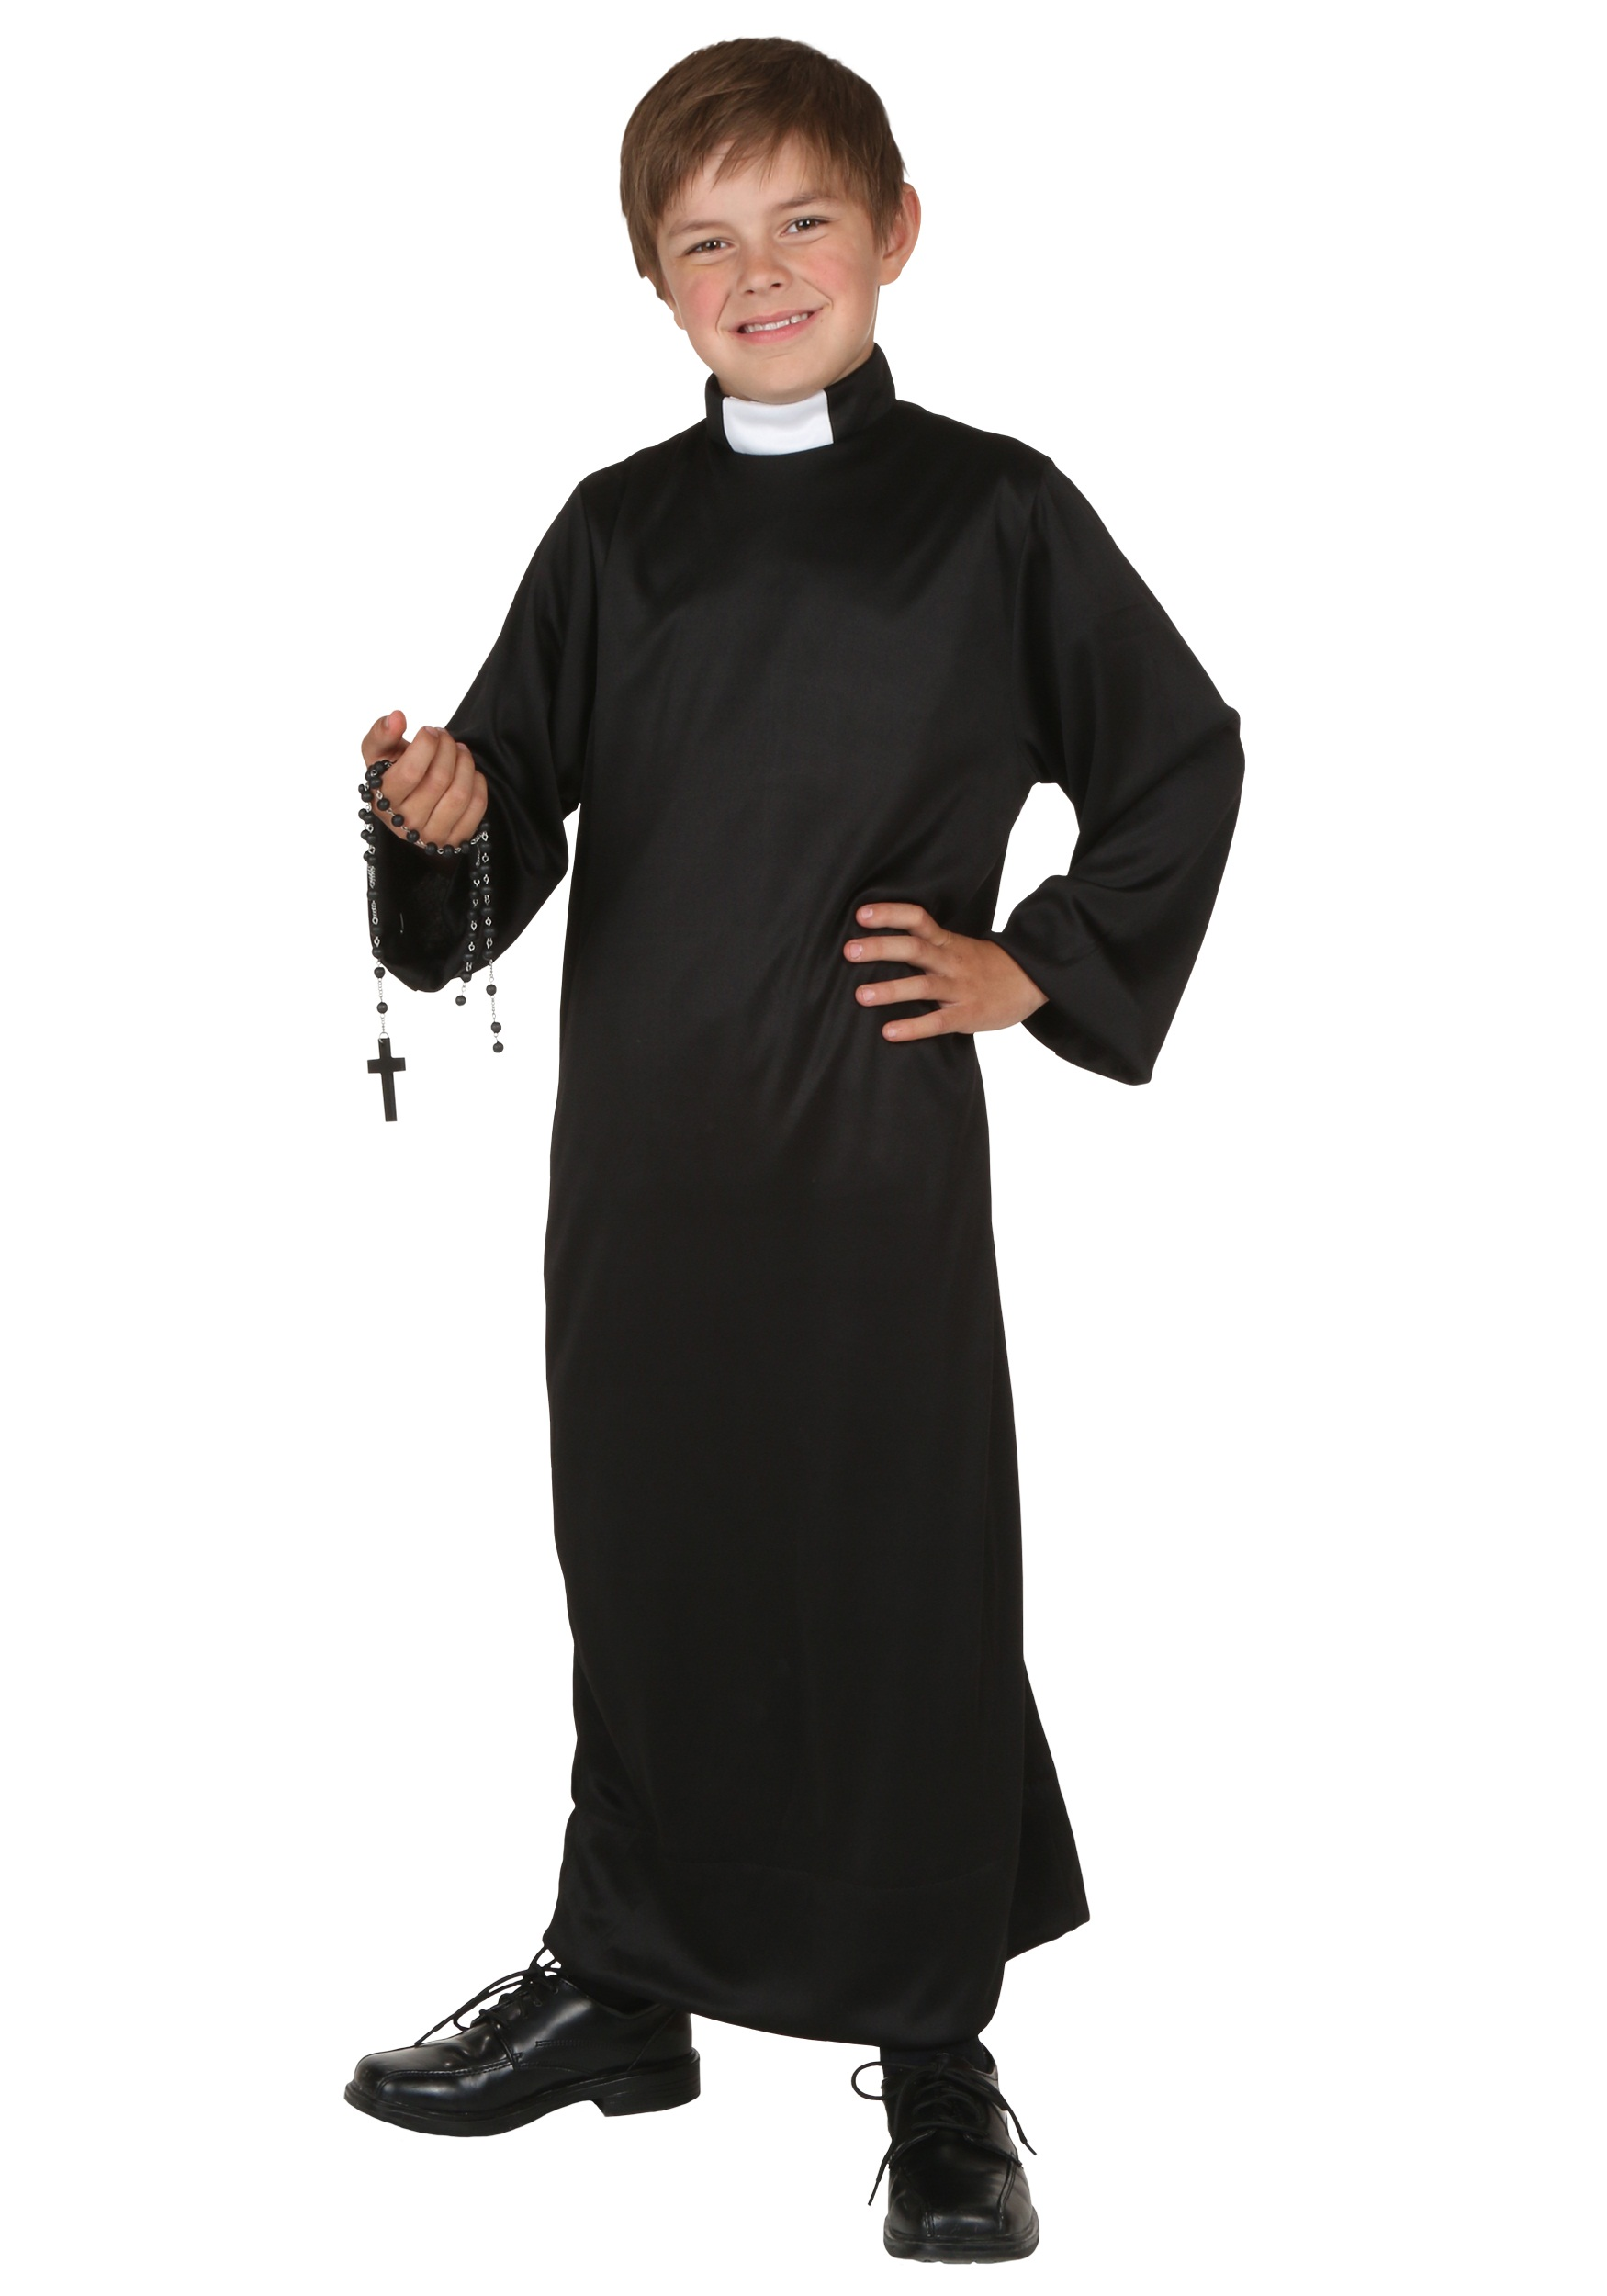 dc161631db9 Priest Robes   Cardinal Costumes - HalloweenCostumes.com - Halloween ...